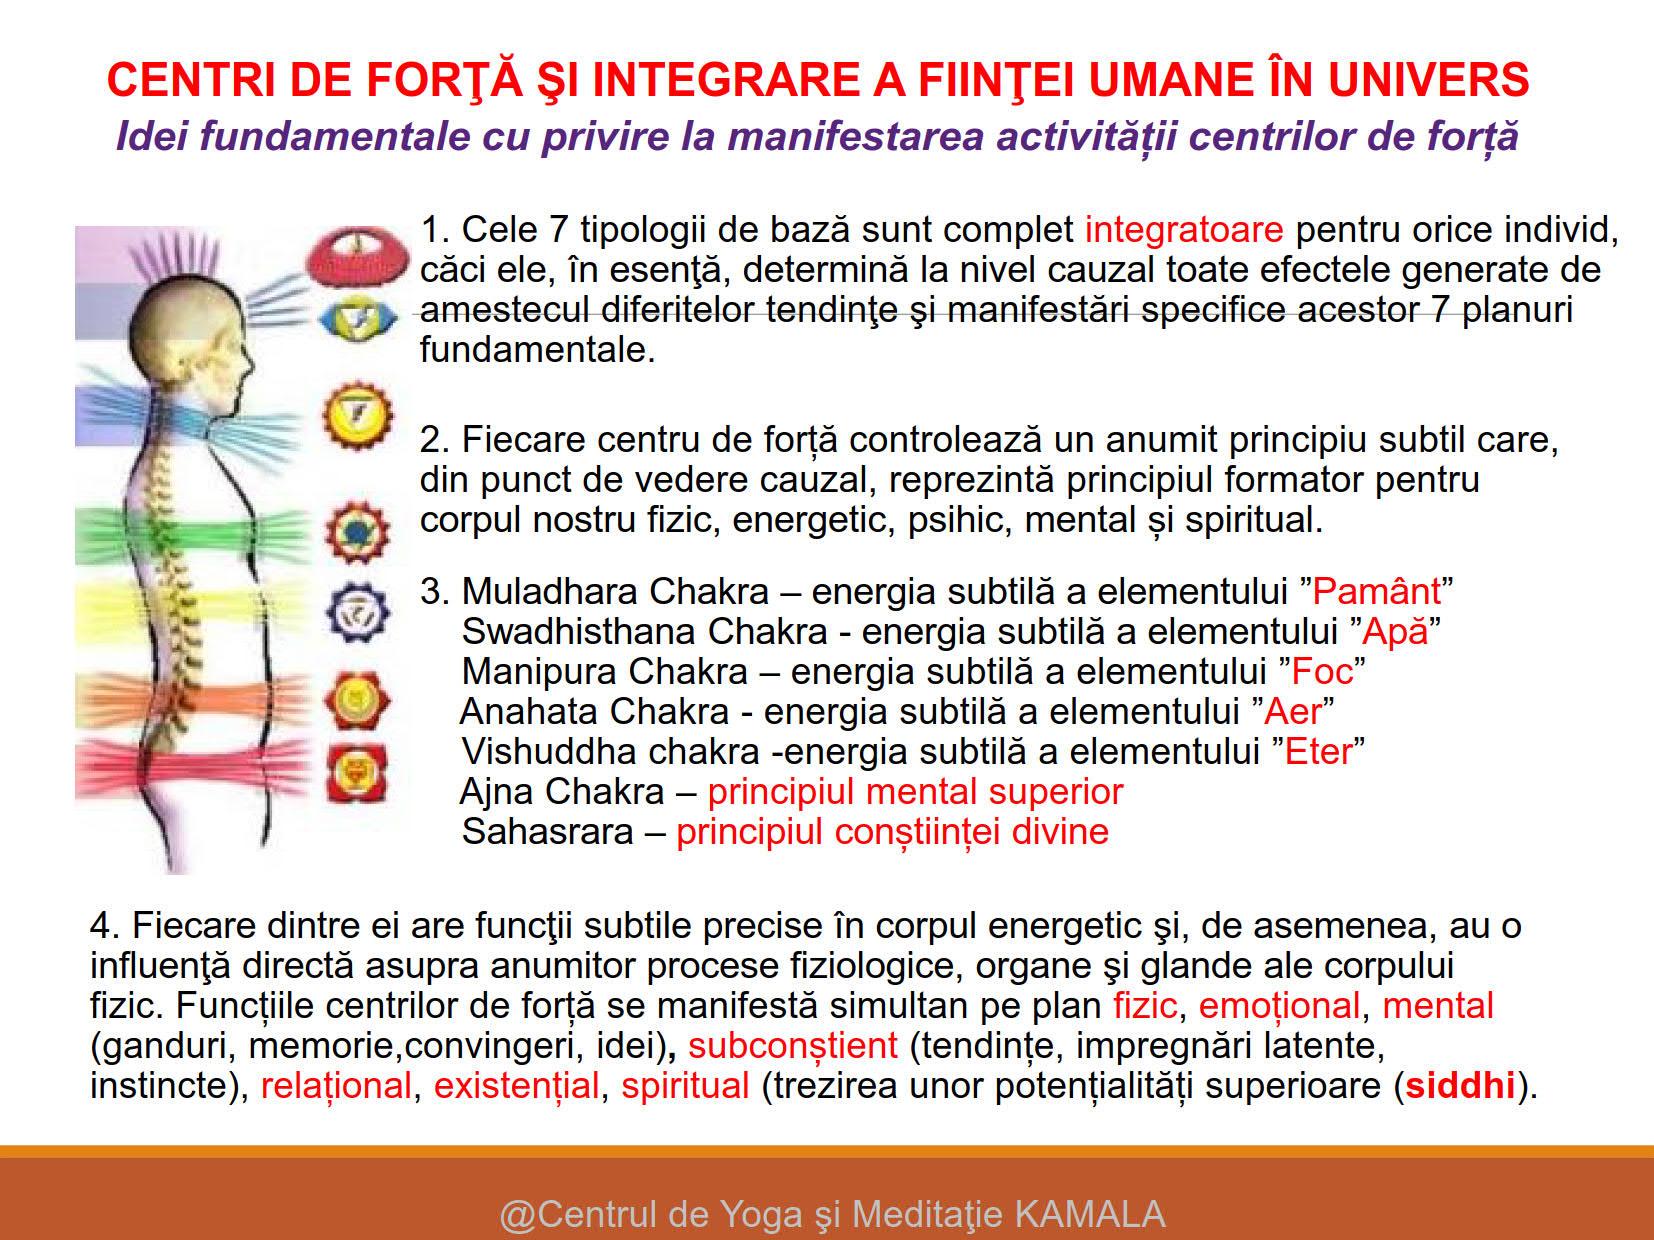 CENTRI DE FORTA - SINTEZA_9